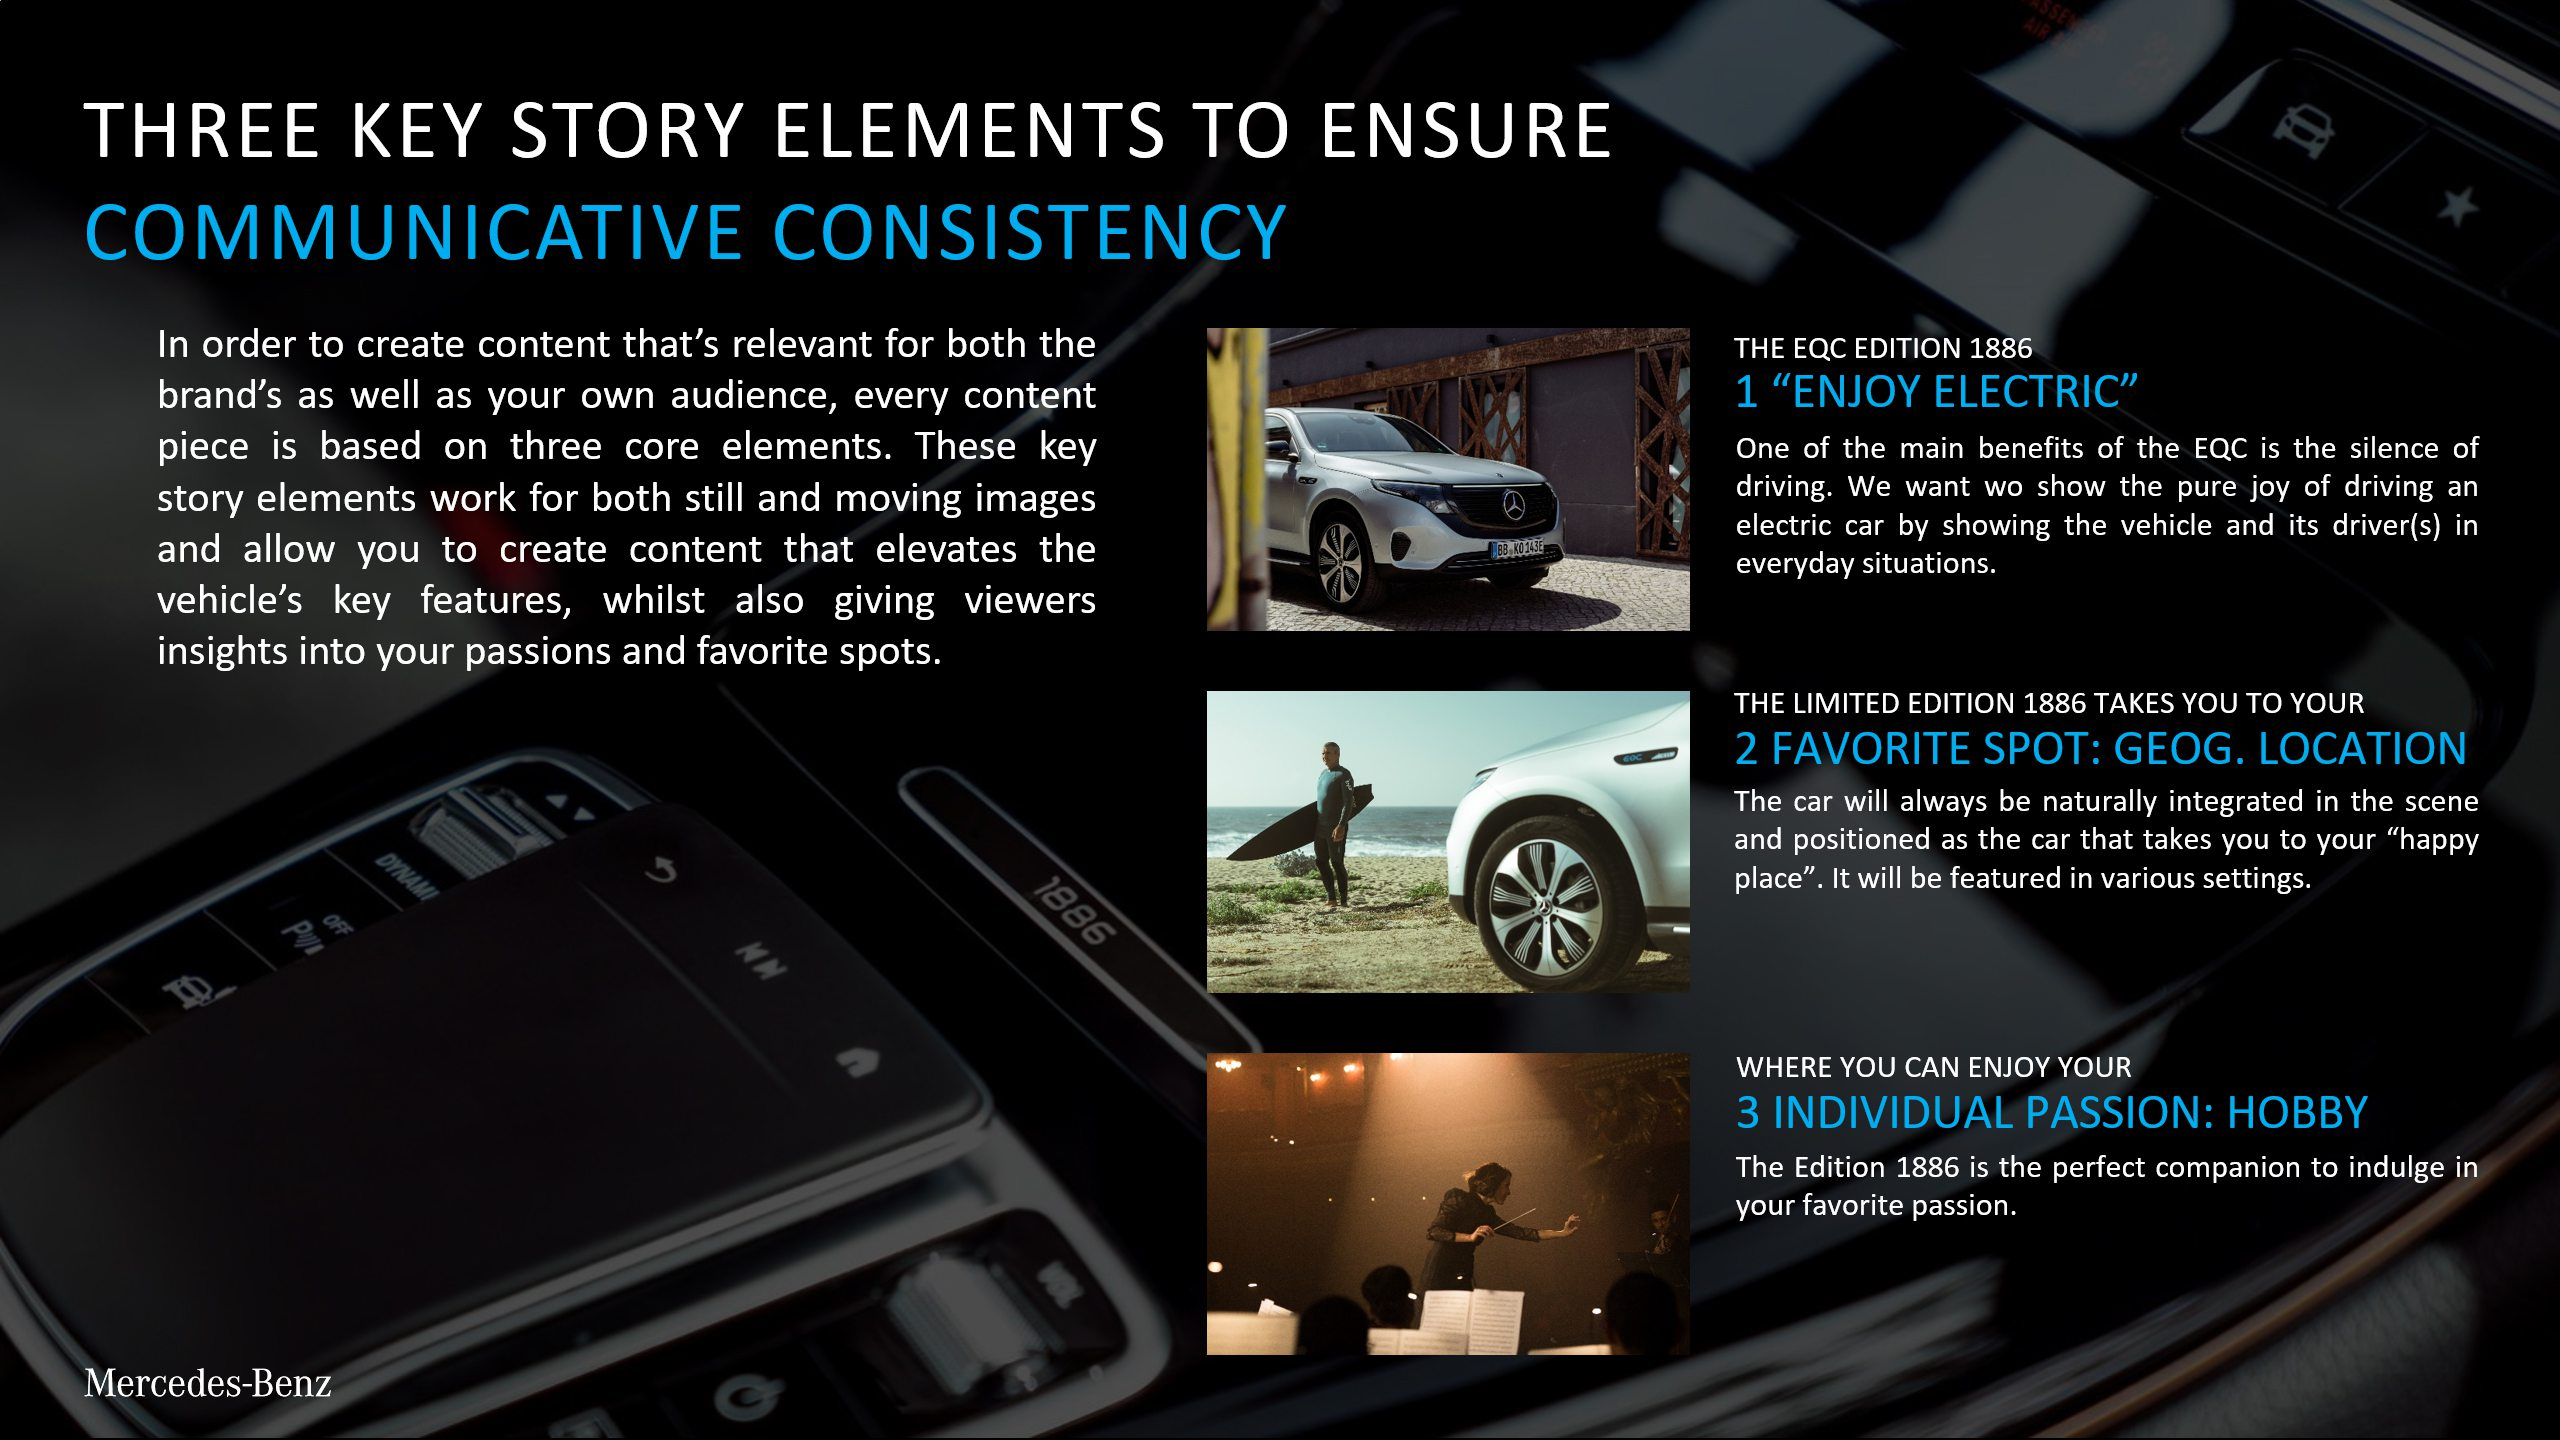 Mercedes PowerPoint Konsistenz